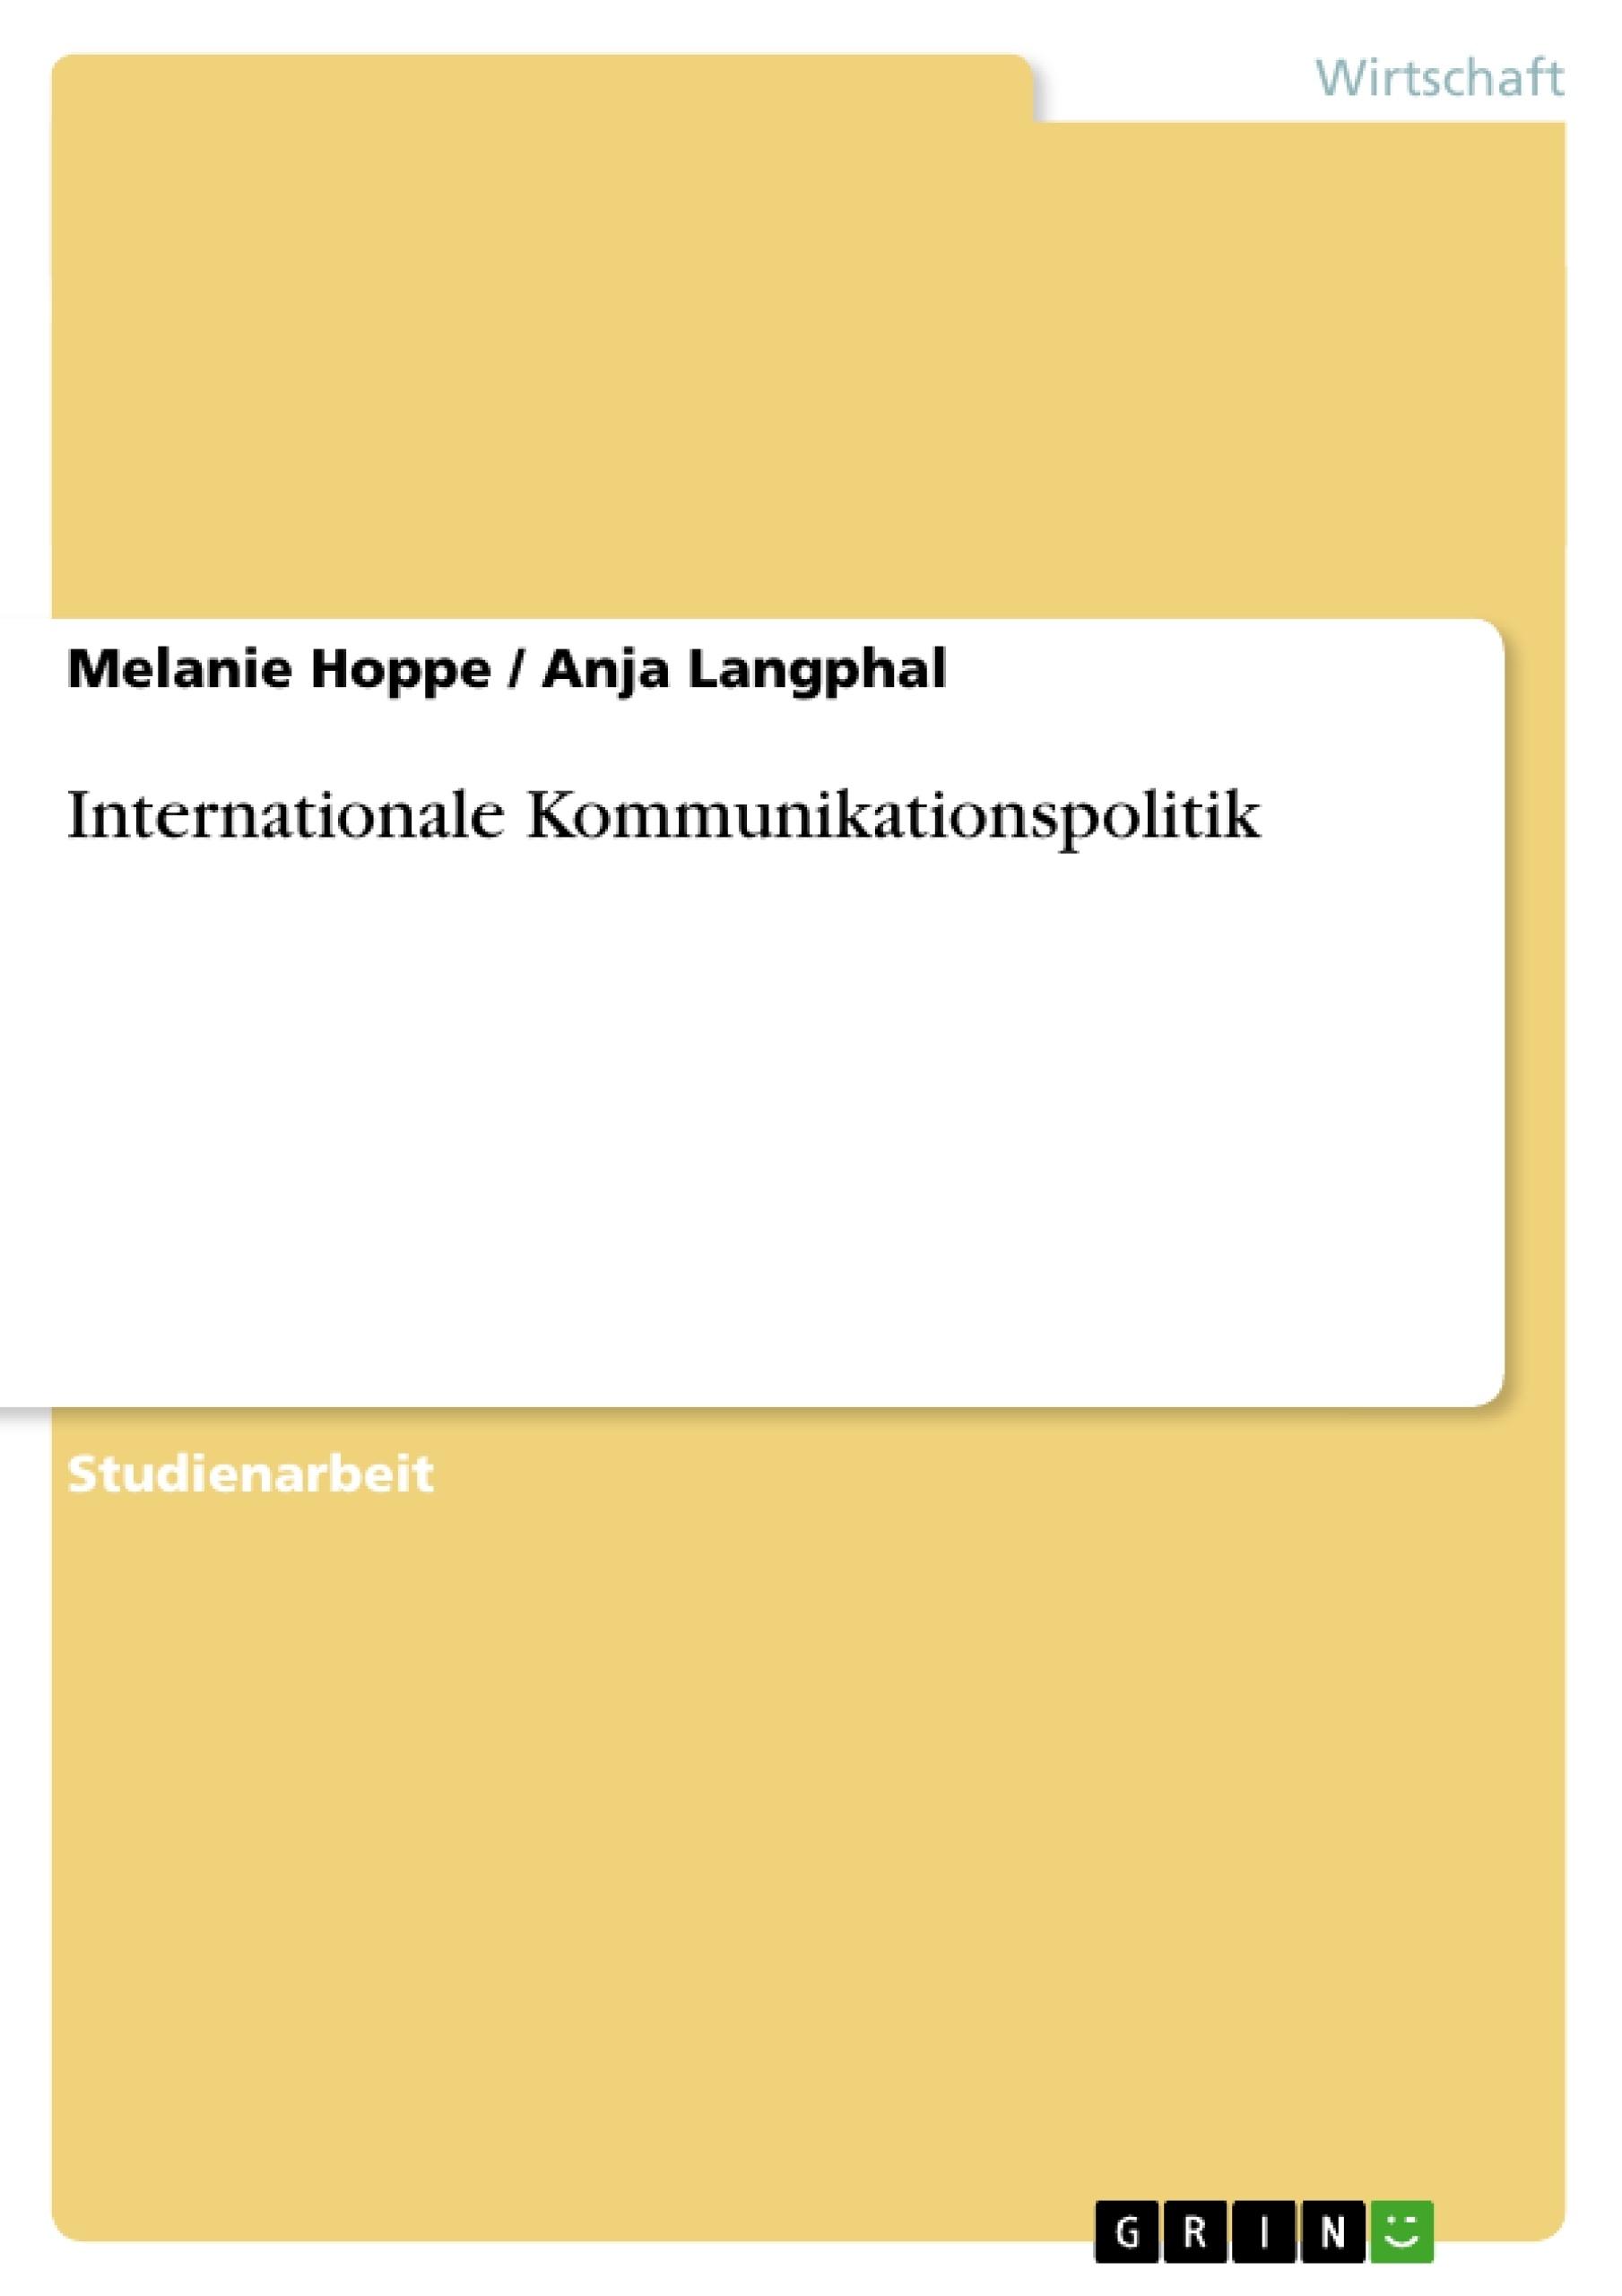 Titel: Internationale Kommunikationspolitik